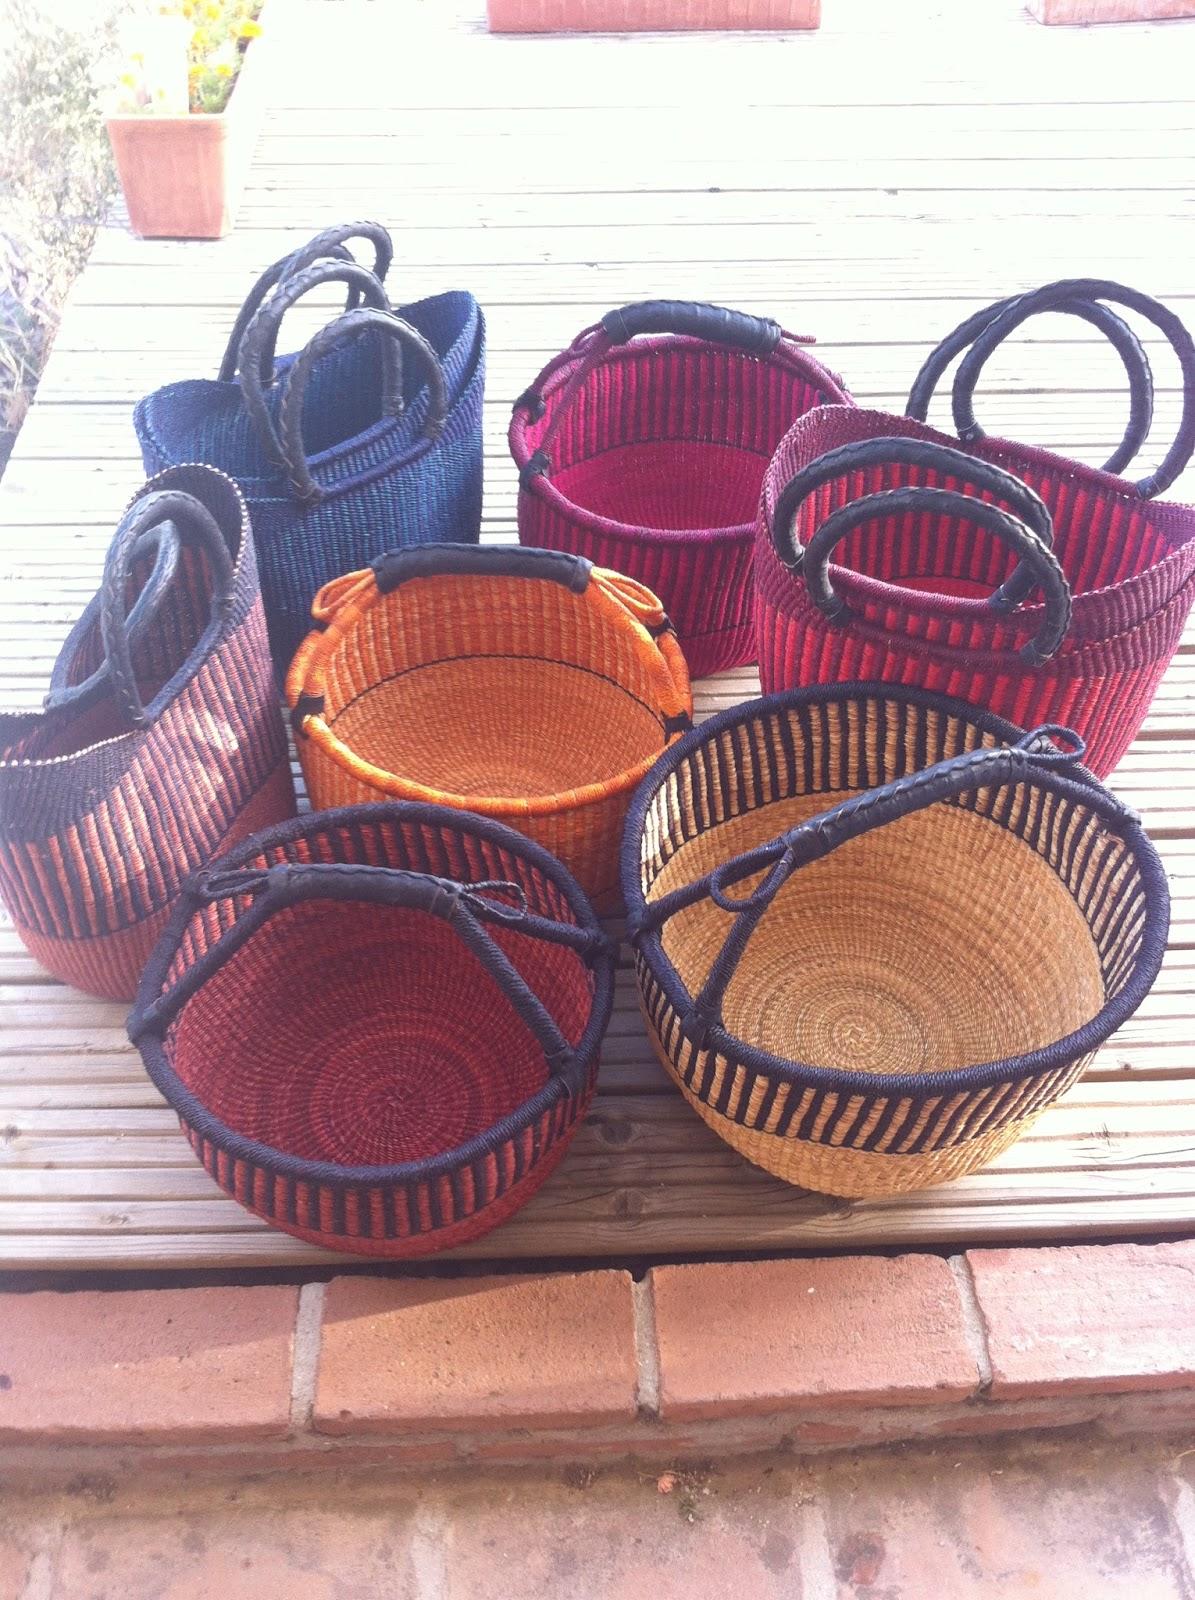 Handmade Ghana Baskets : Digame for sale handmade fair trade baskets from ghana